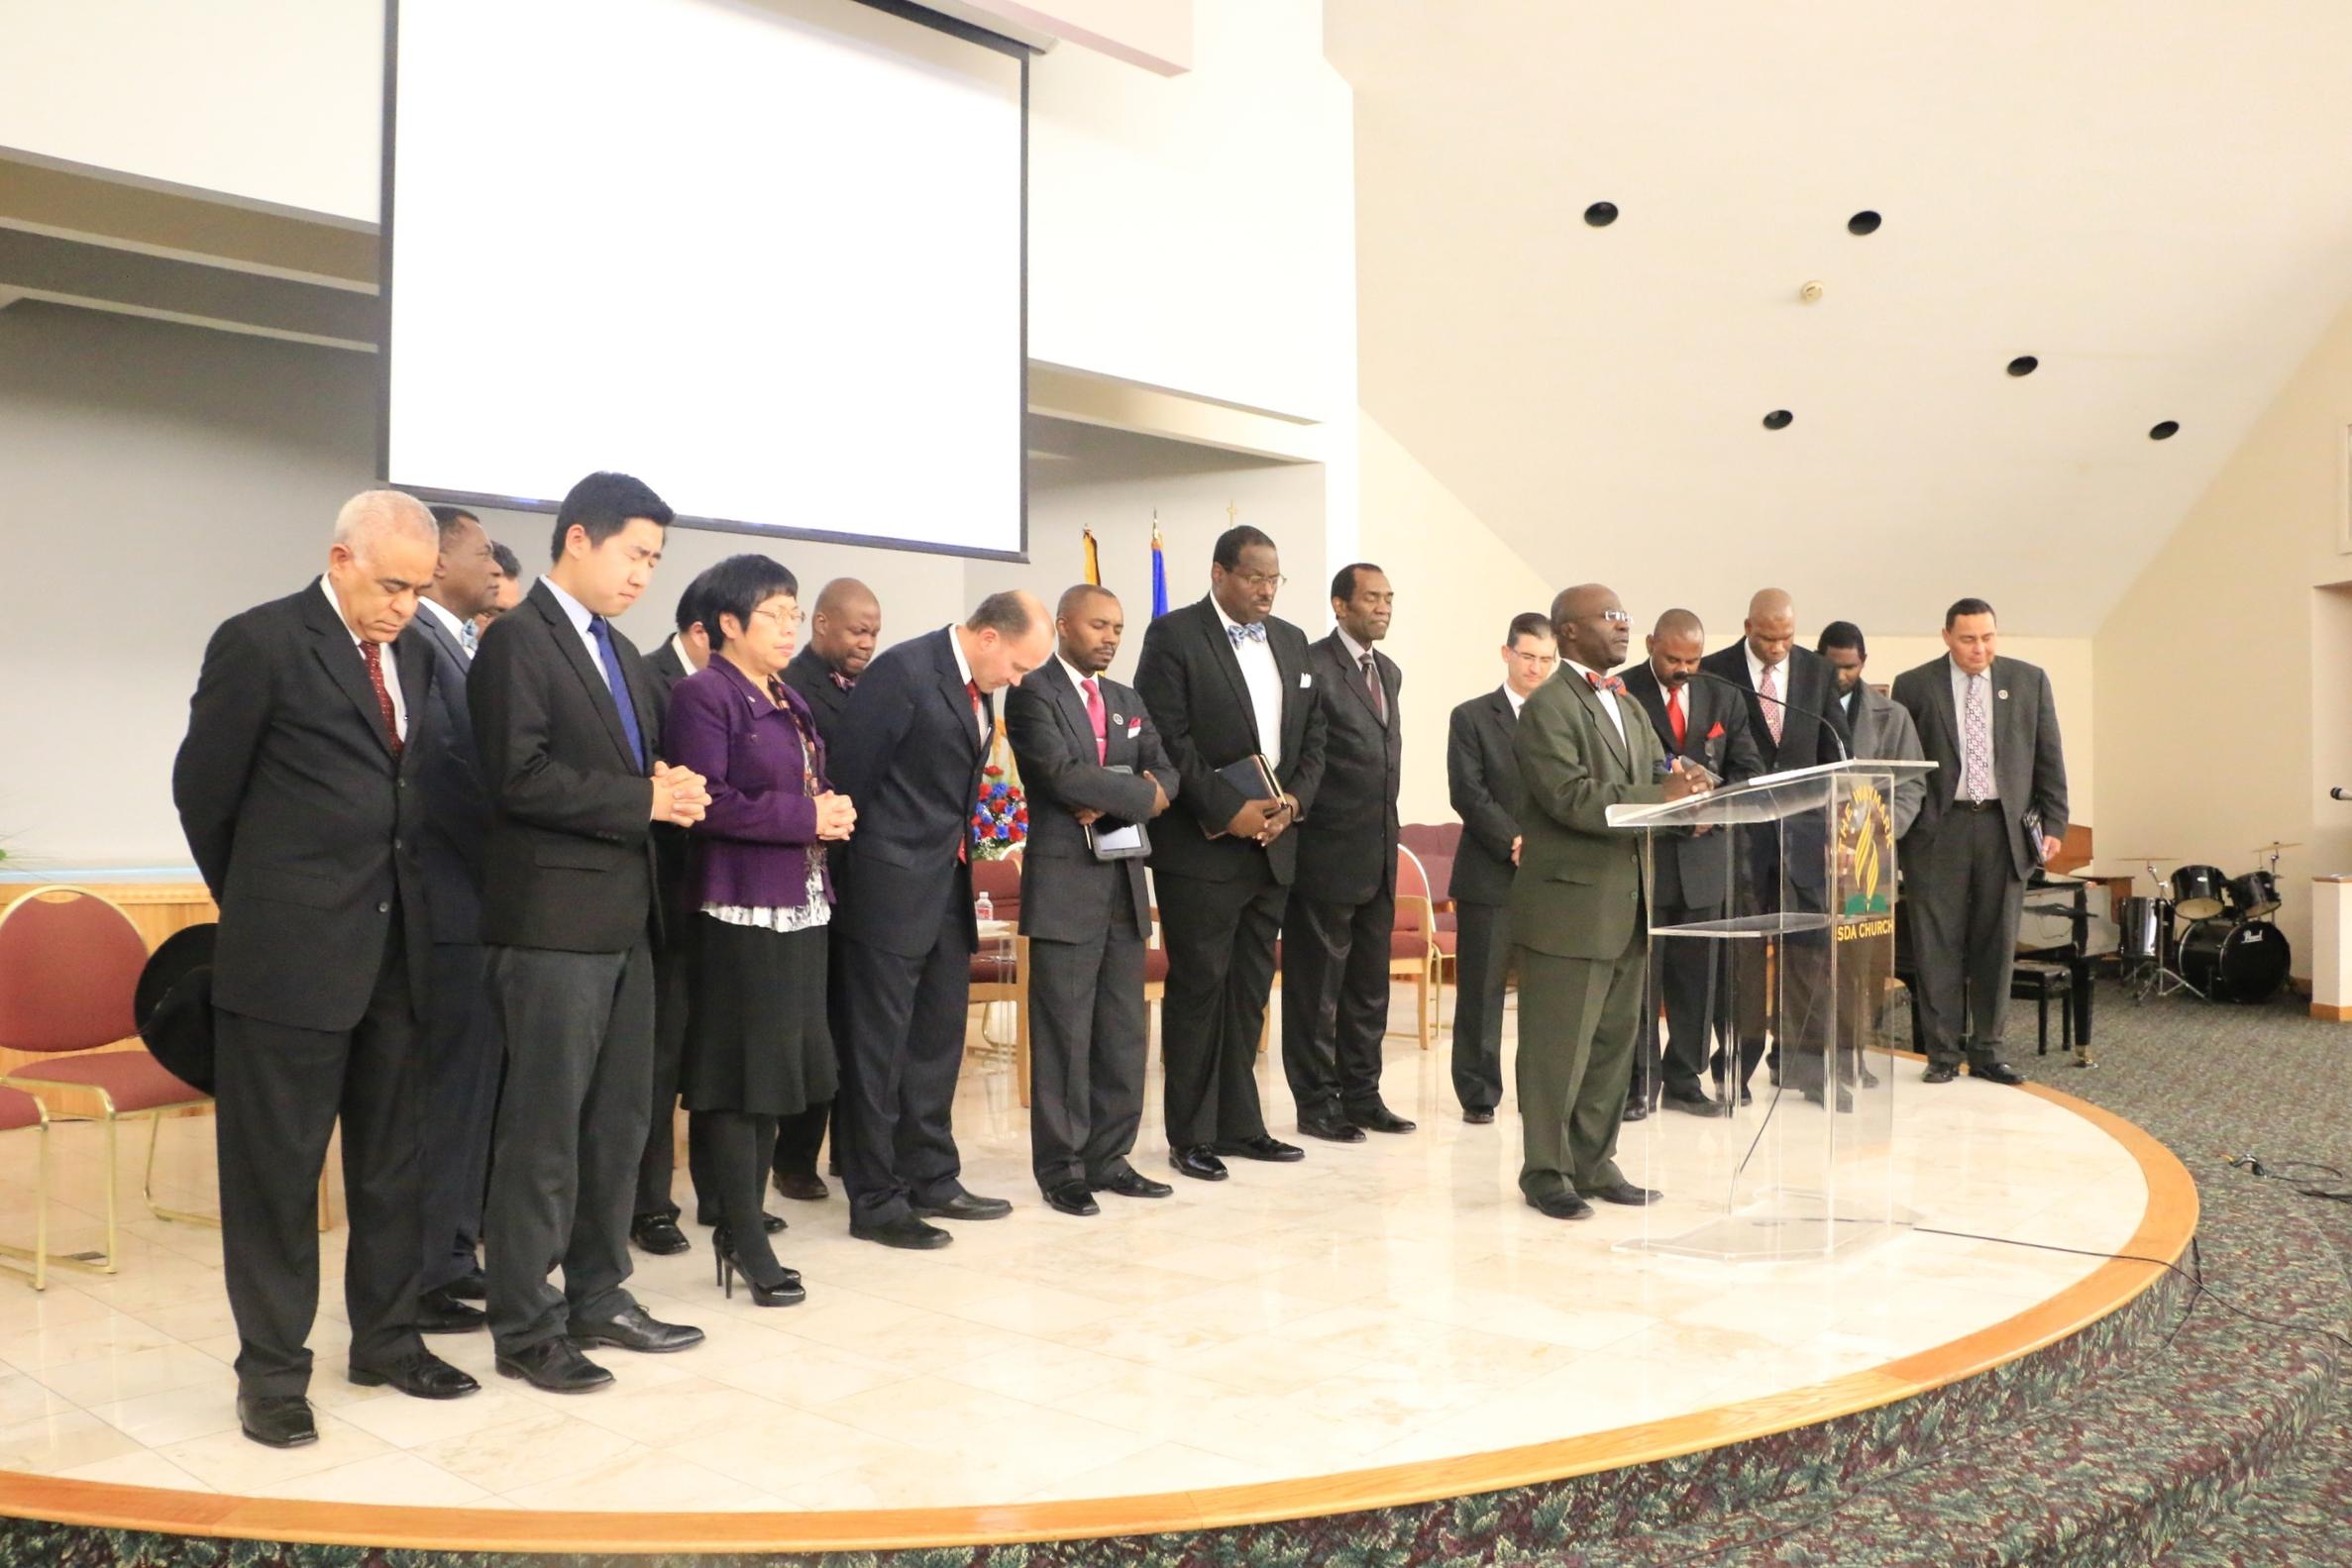 Elder John Amoah offers a dedicatory prayer, with Boston-area pastors behind him.